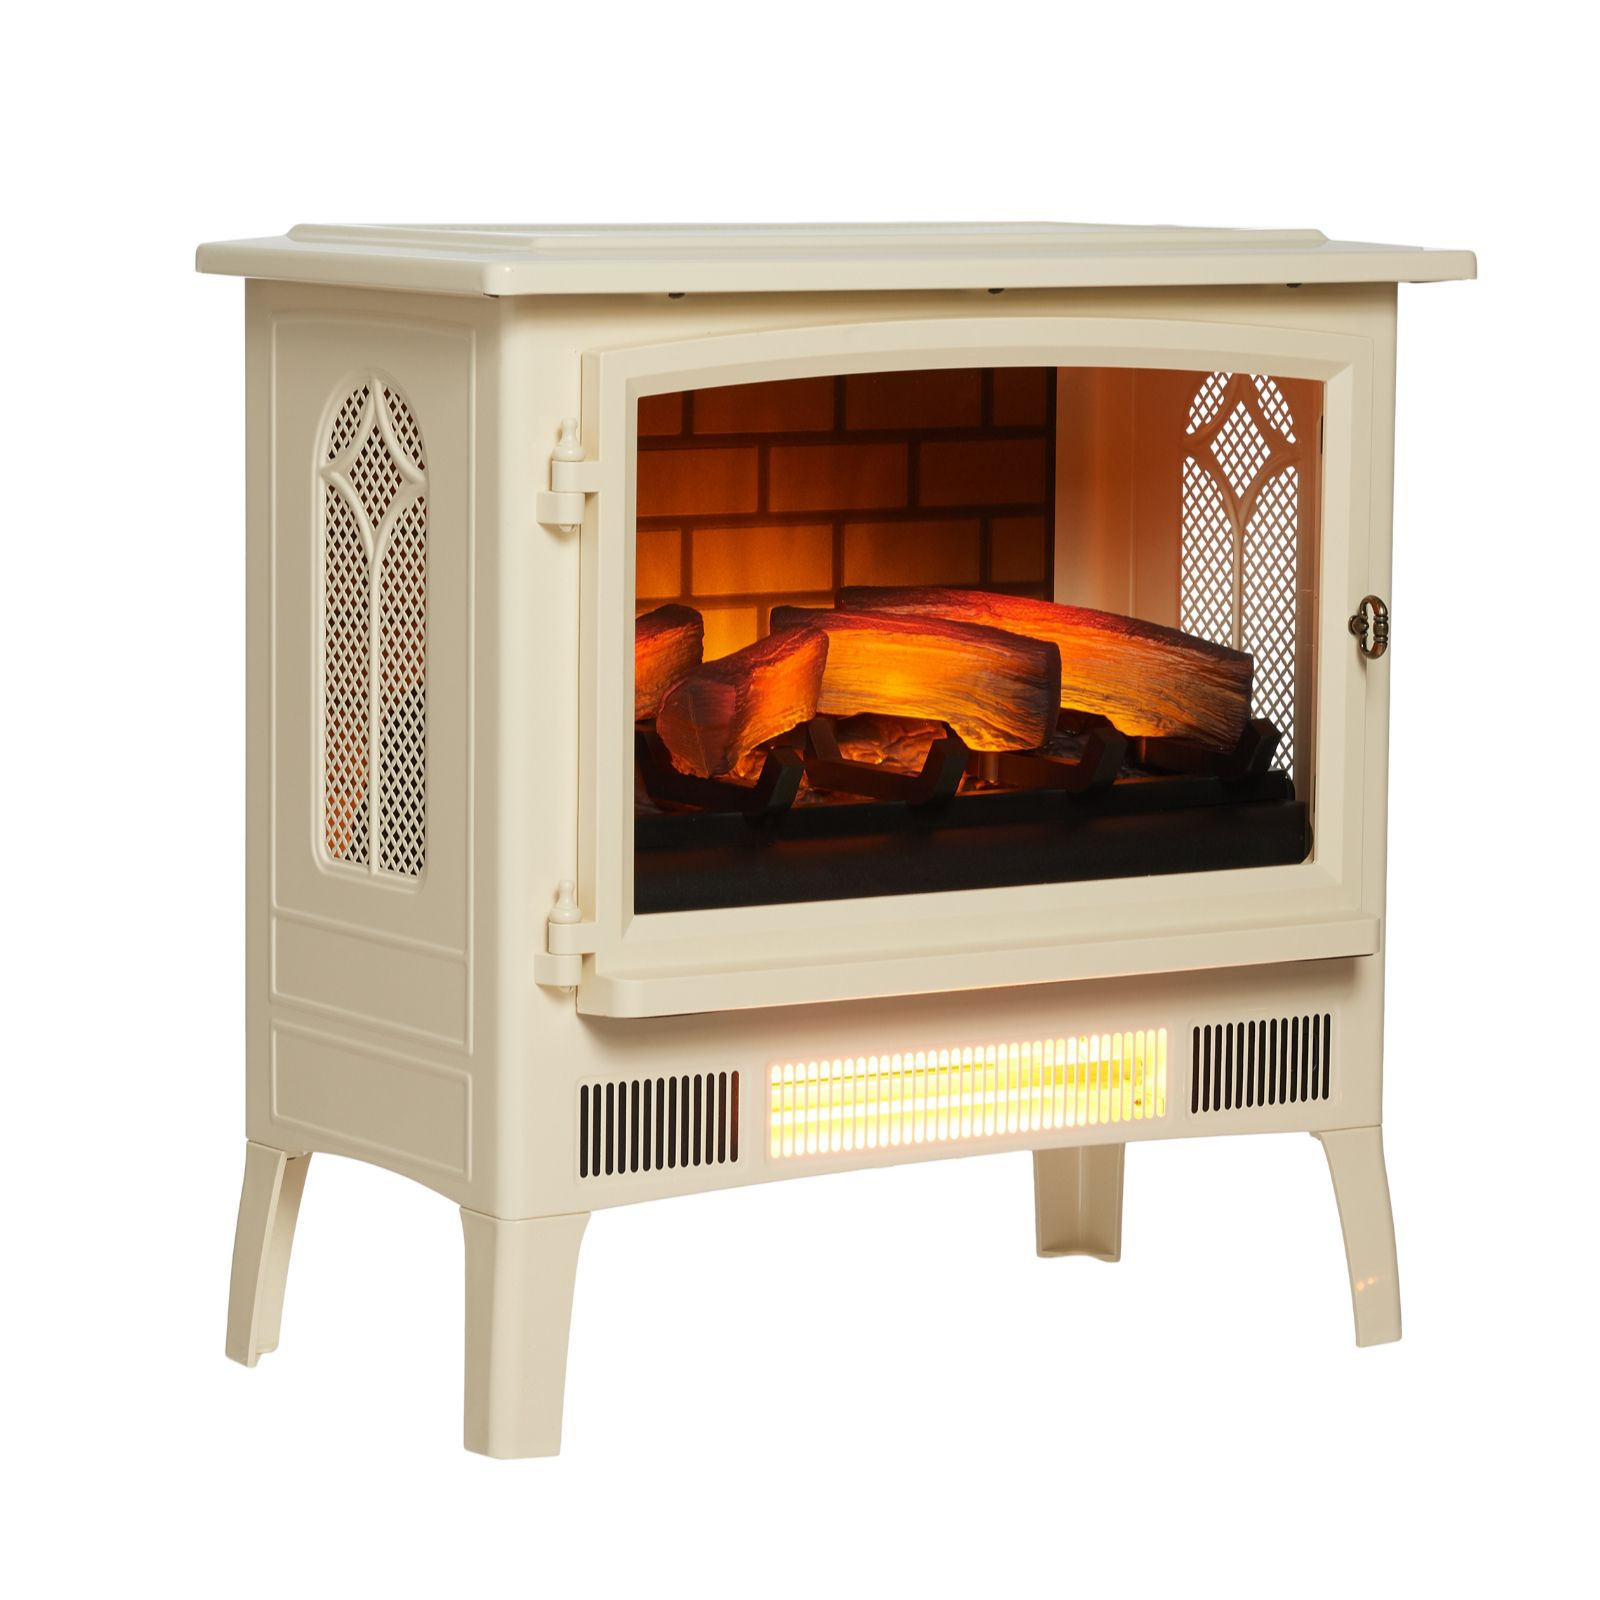 Powerheat Log Burner Style Infragen Heater W 3d Flame Effect Rocket Stove Diagram Oven Fireplace Earthen Pint Remote Qvc Uk